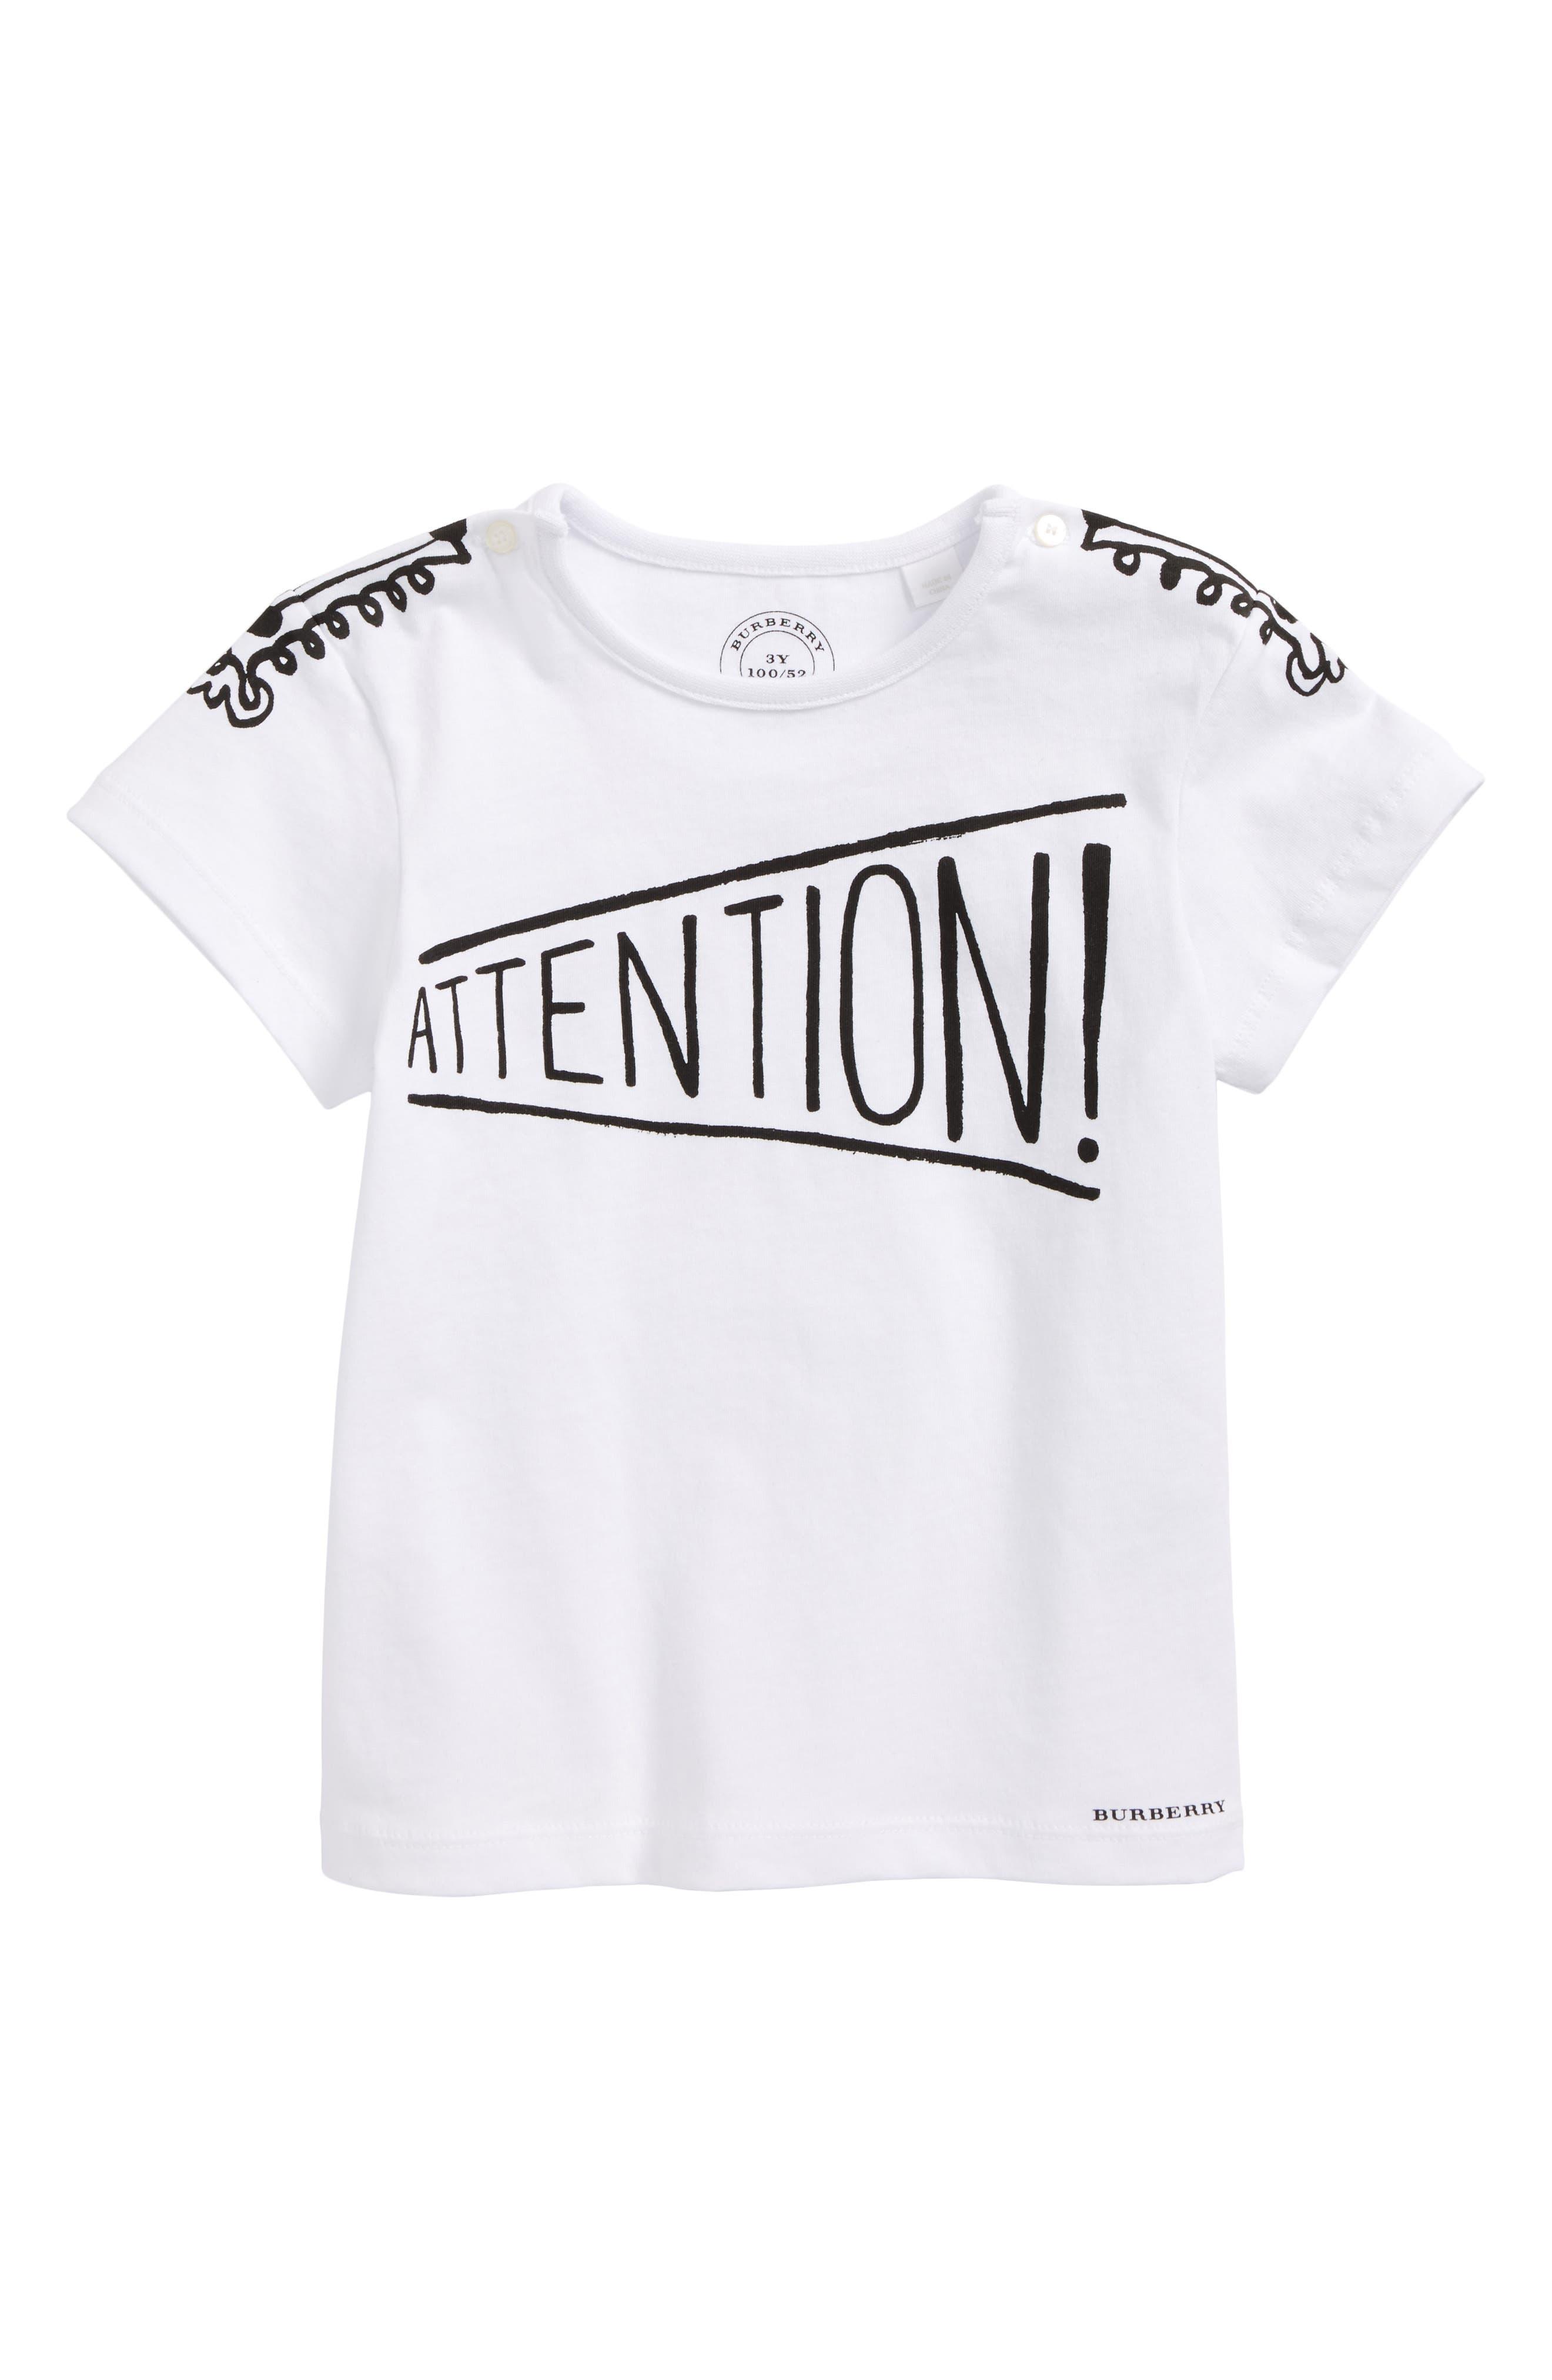 Attention T-Shirt,                             Main thumbnail 1, color,                             100